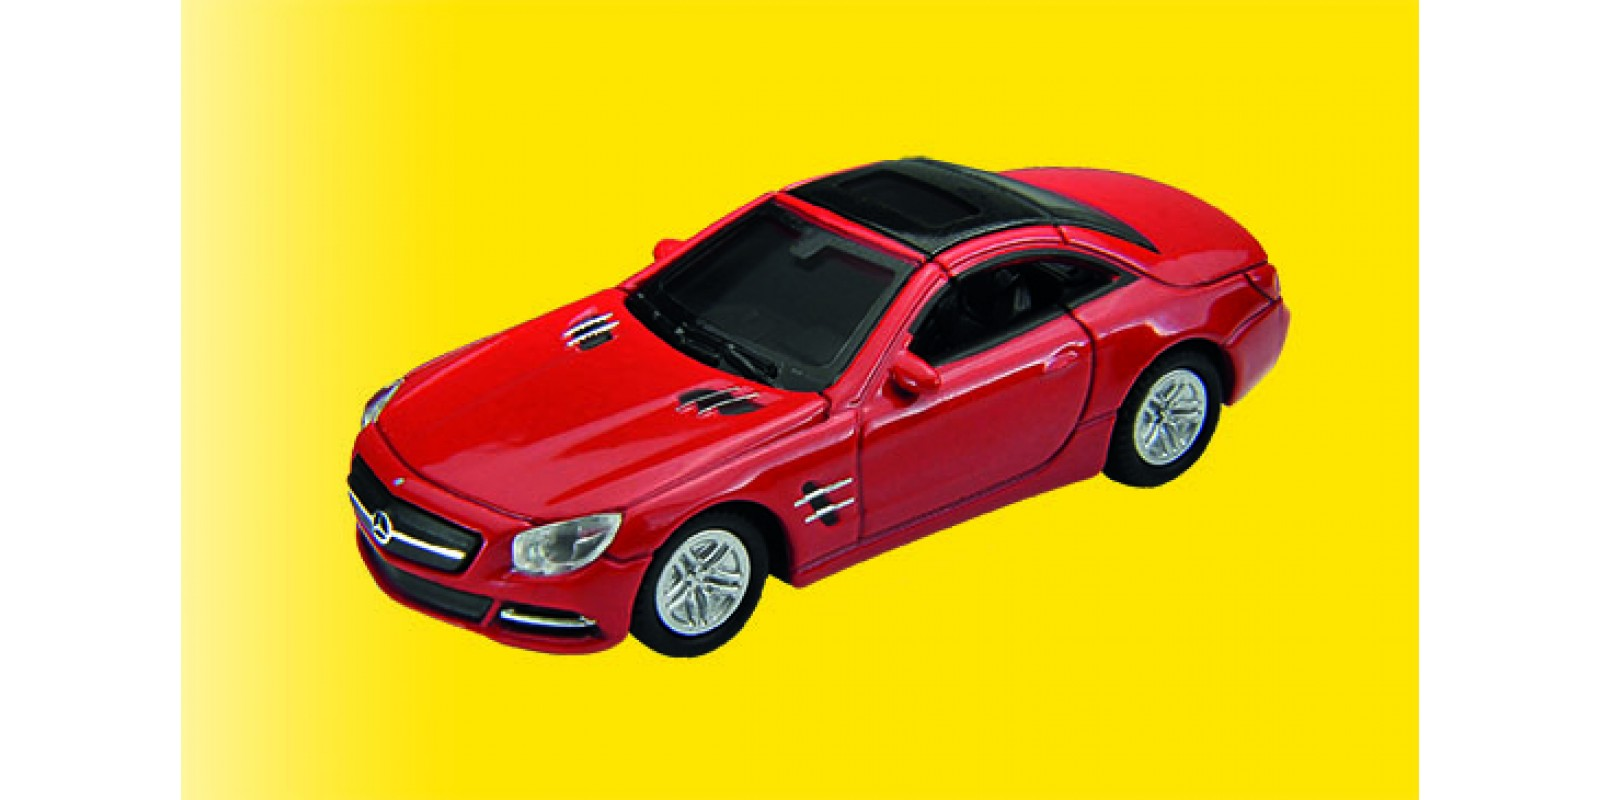 Vo41640 H0 Mercedes-Benz 500 SL 2012, red, finished model